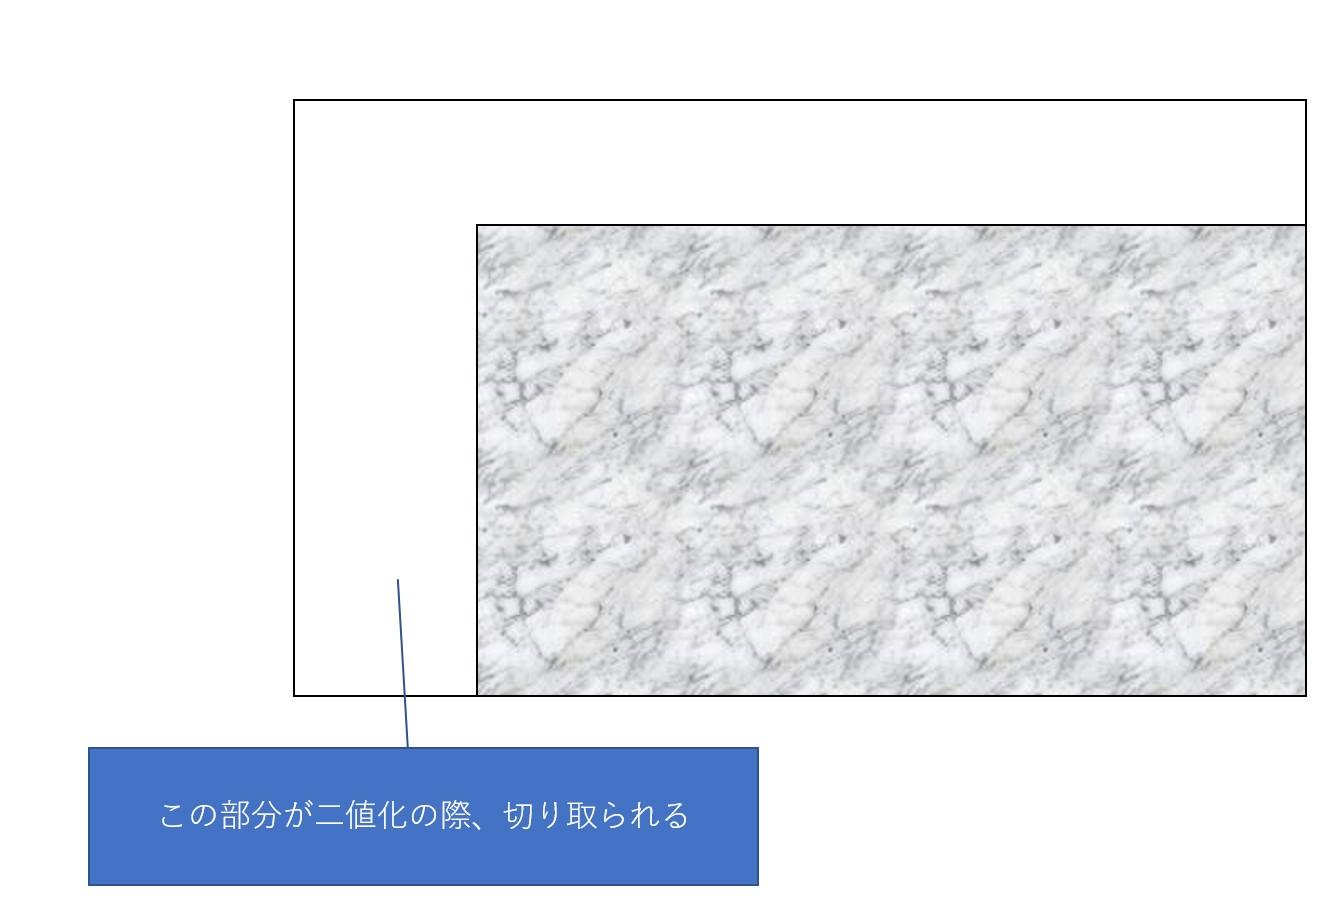 f:id:yasuo_ssi:20210411081431j:plain